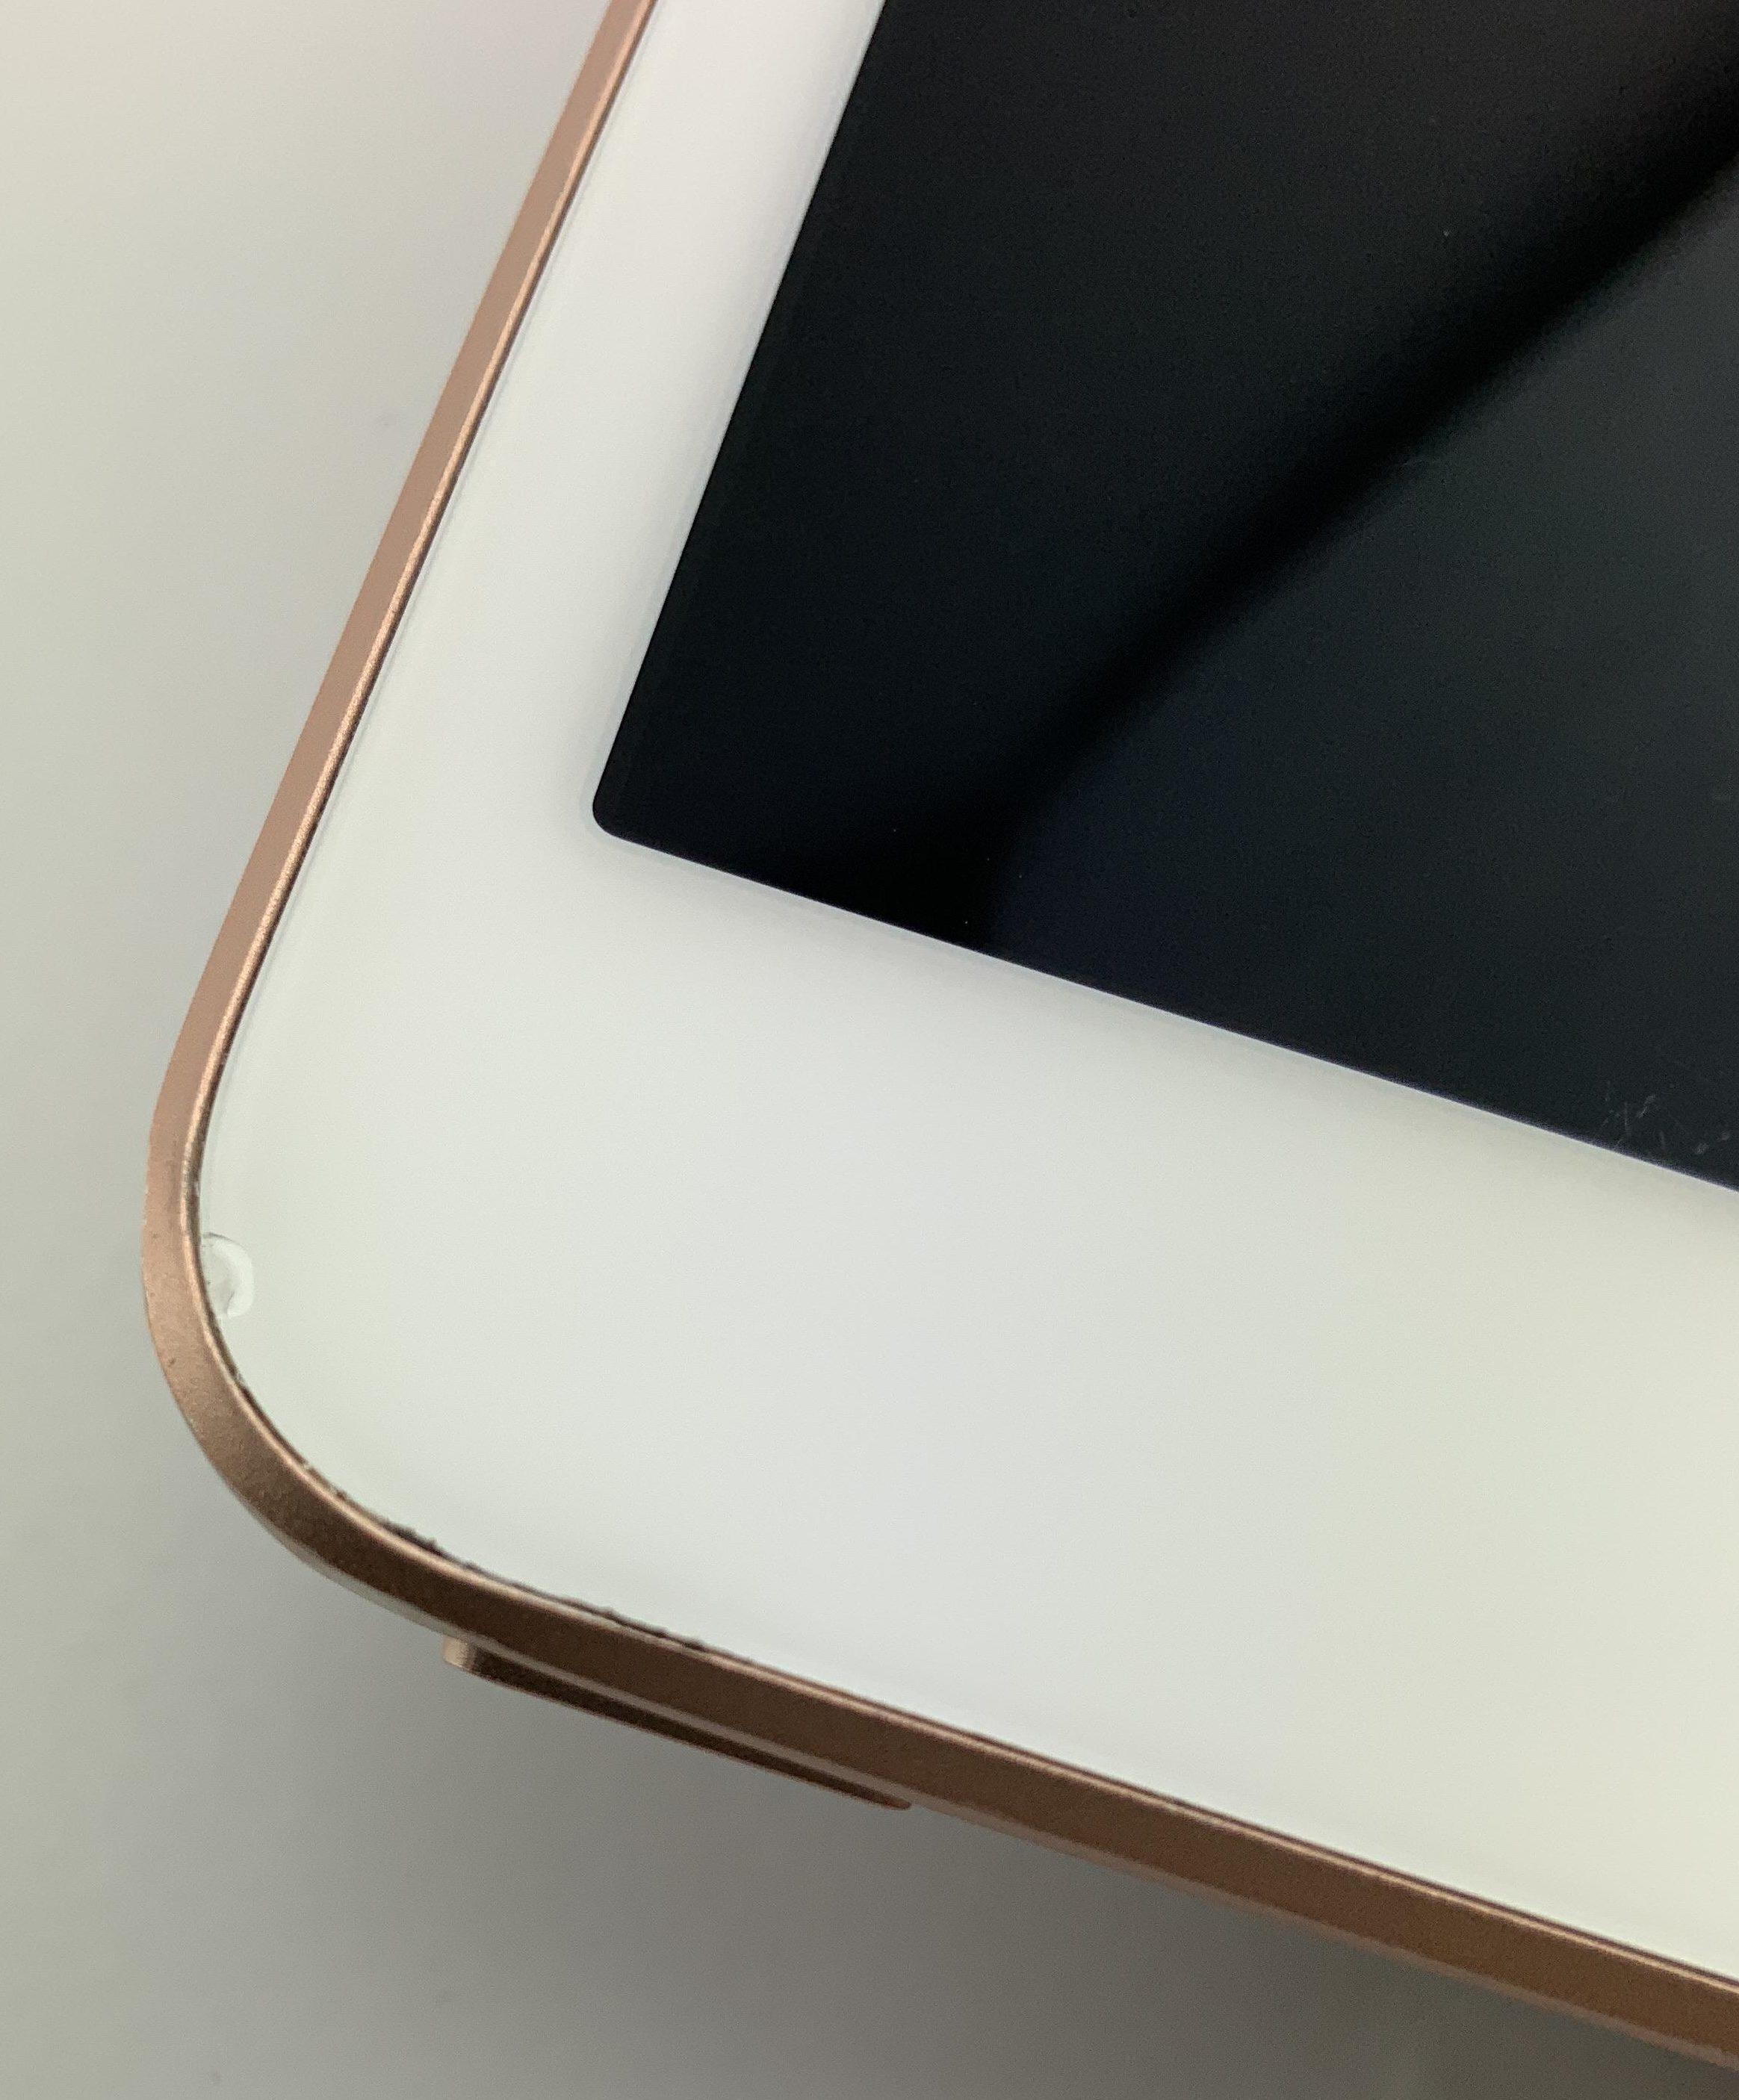 iPad Air 3 Wi-Fi + Cellular 256GB, 256GB, Gold, image 4